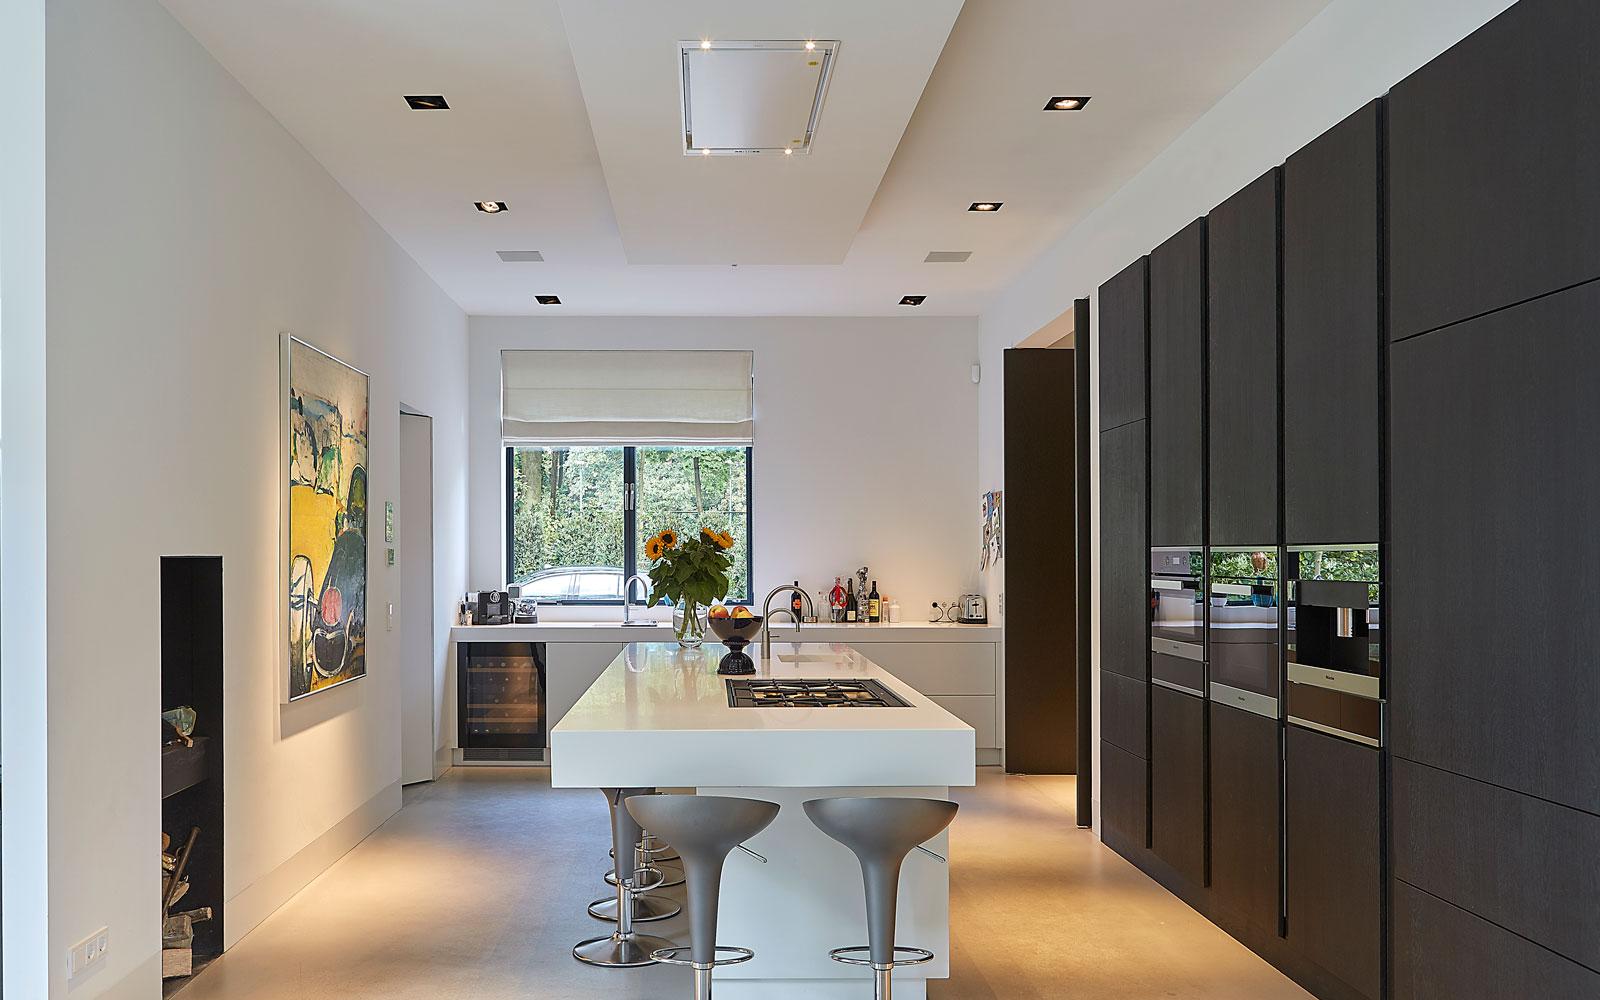 Keuken, maatwerk, Kuivenhoven Keukenfabriek, kookeiland Corian, Quooker heet waterkraan, symmetrische villa, PBV Architects